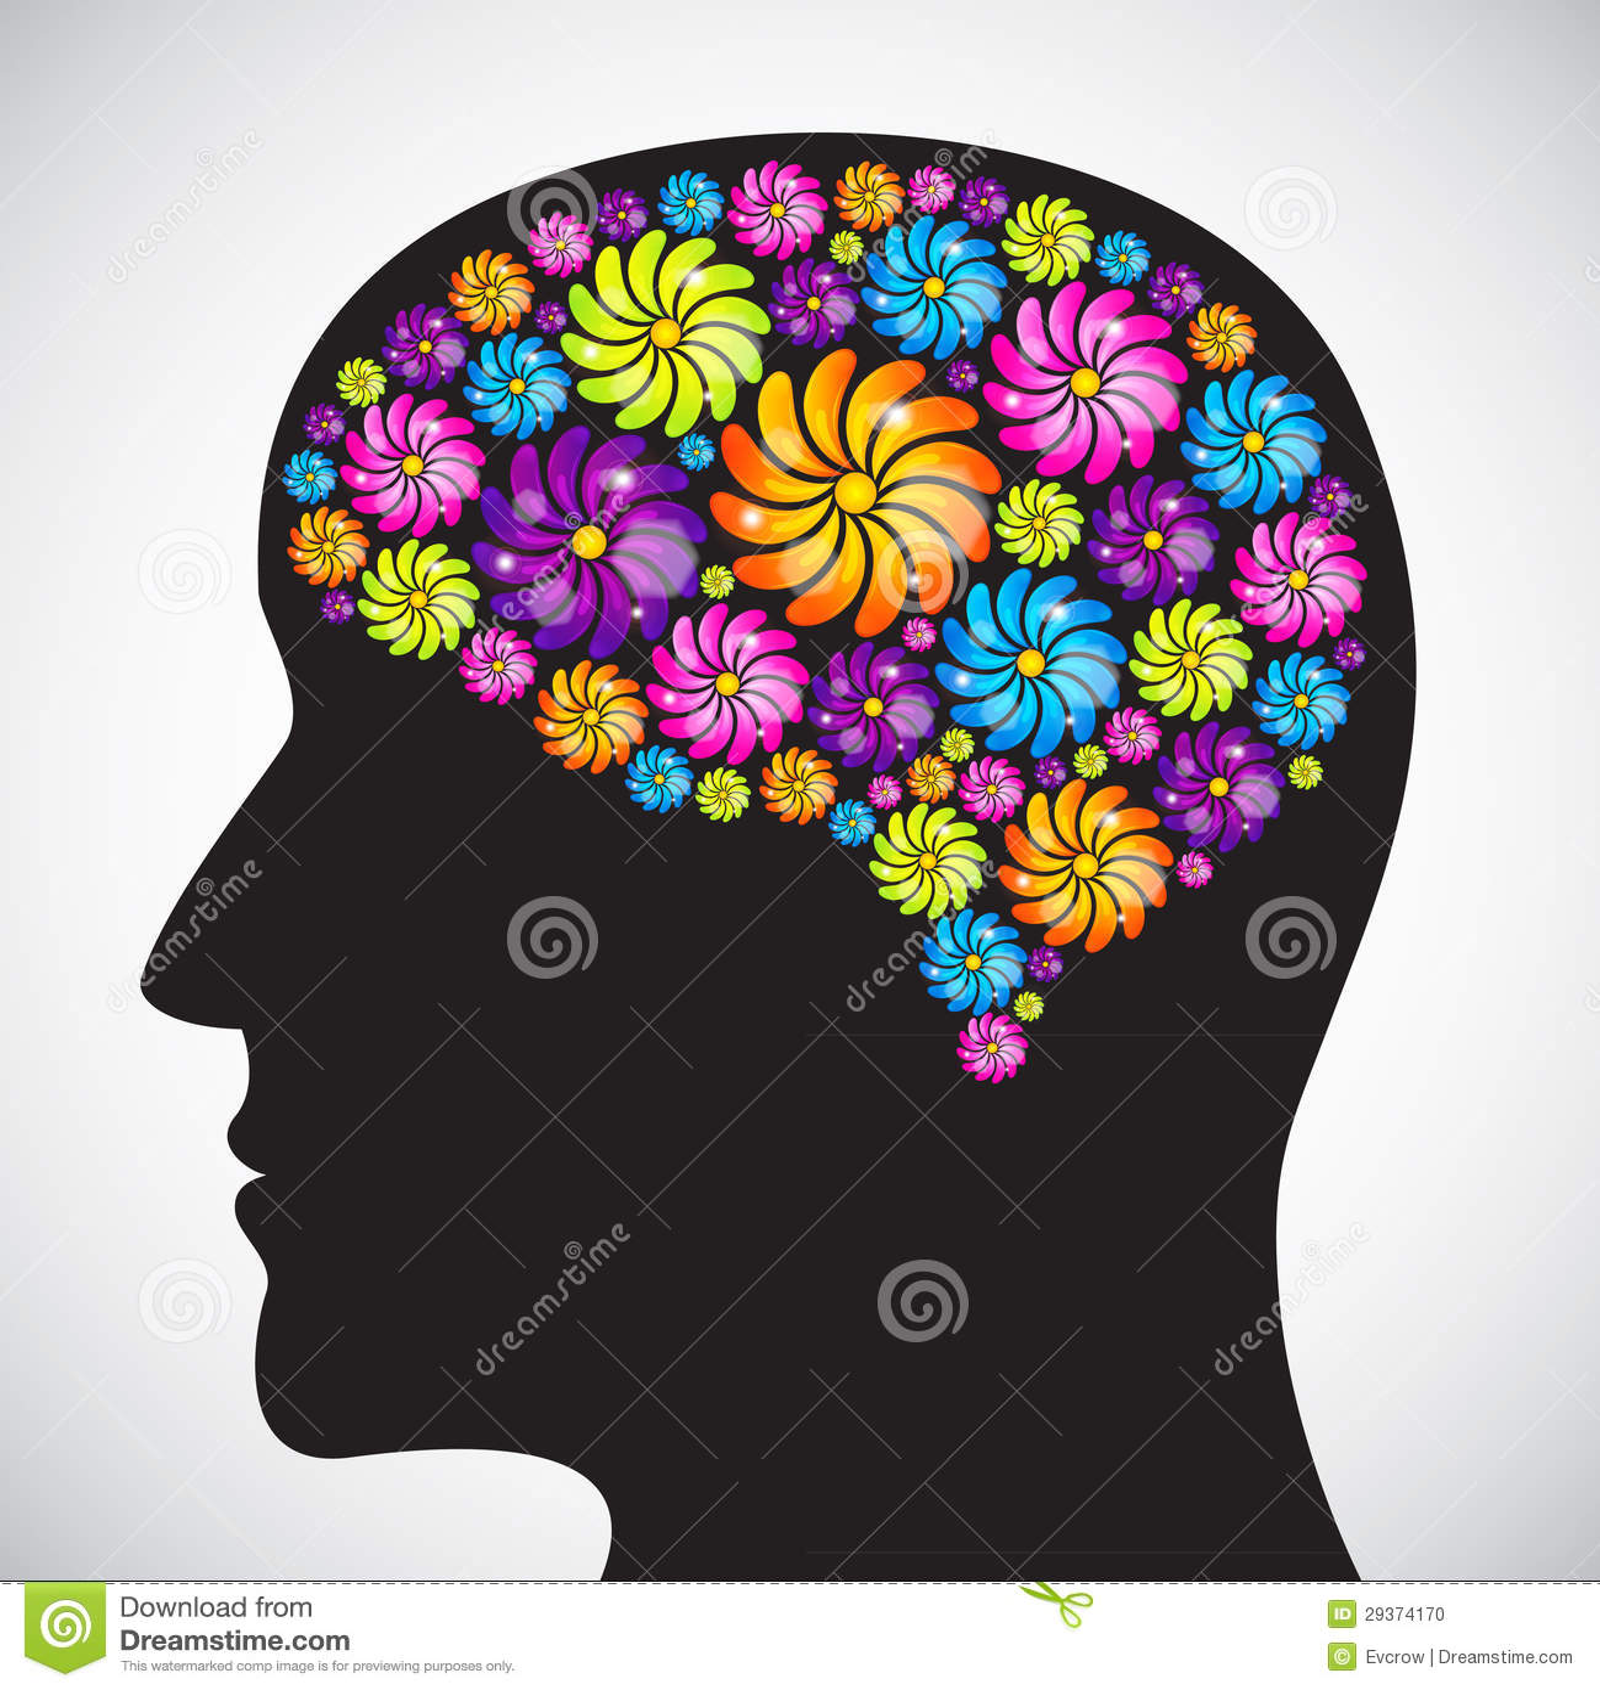 Mind profile